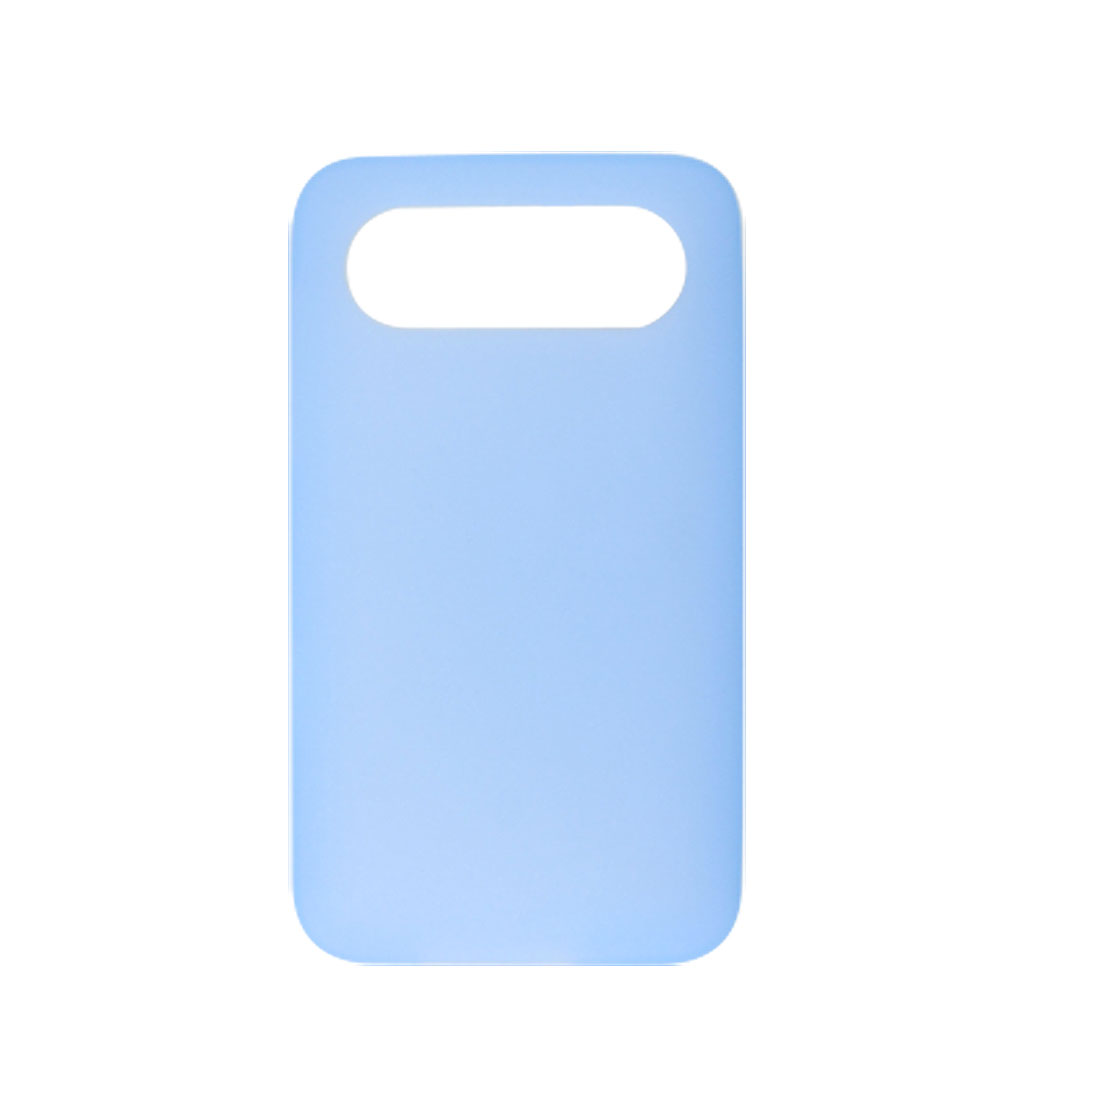 Light Blue Soft Silicone Skin Back Guard Case for HTC Schubert HD7